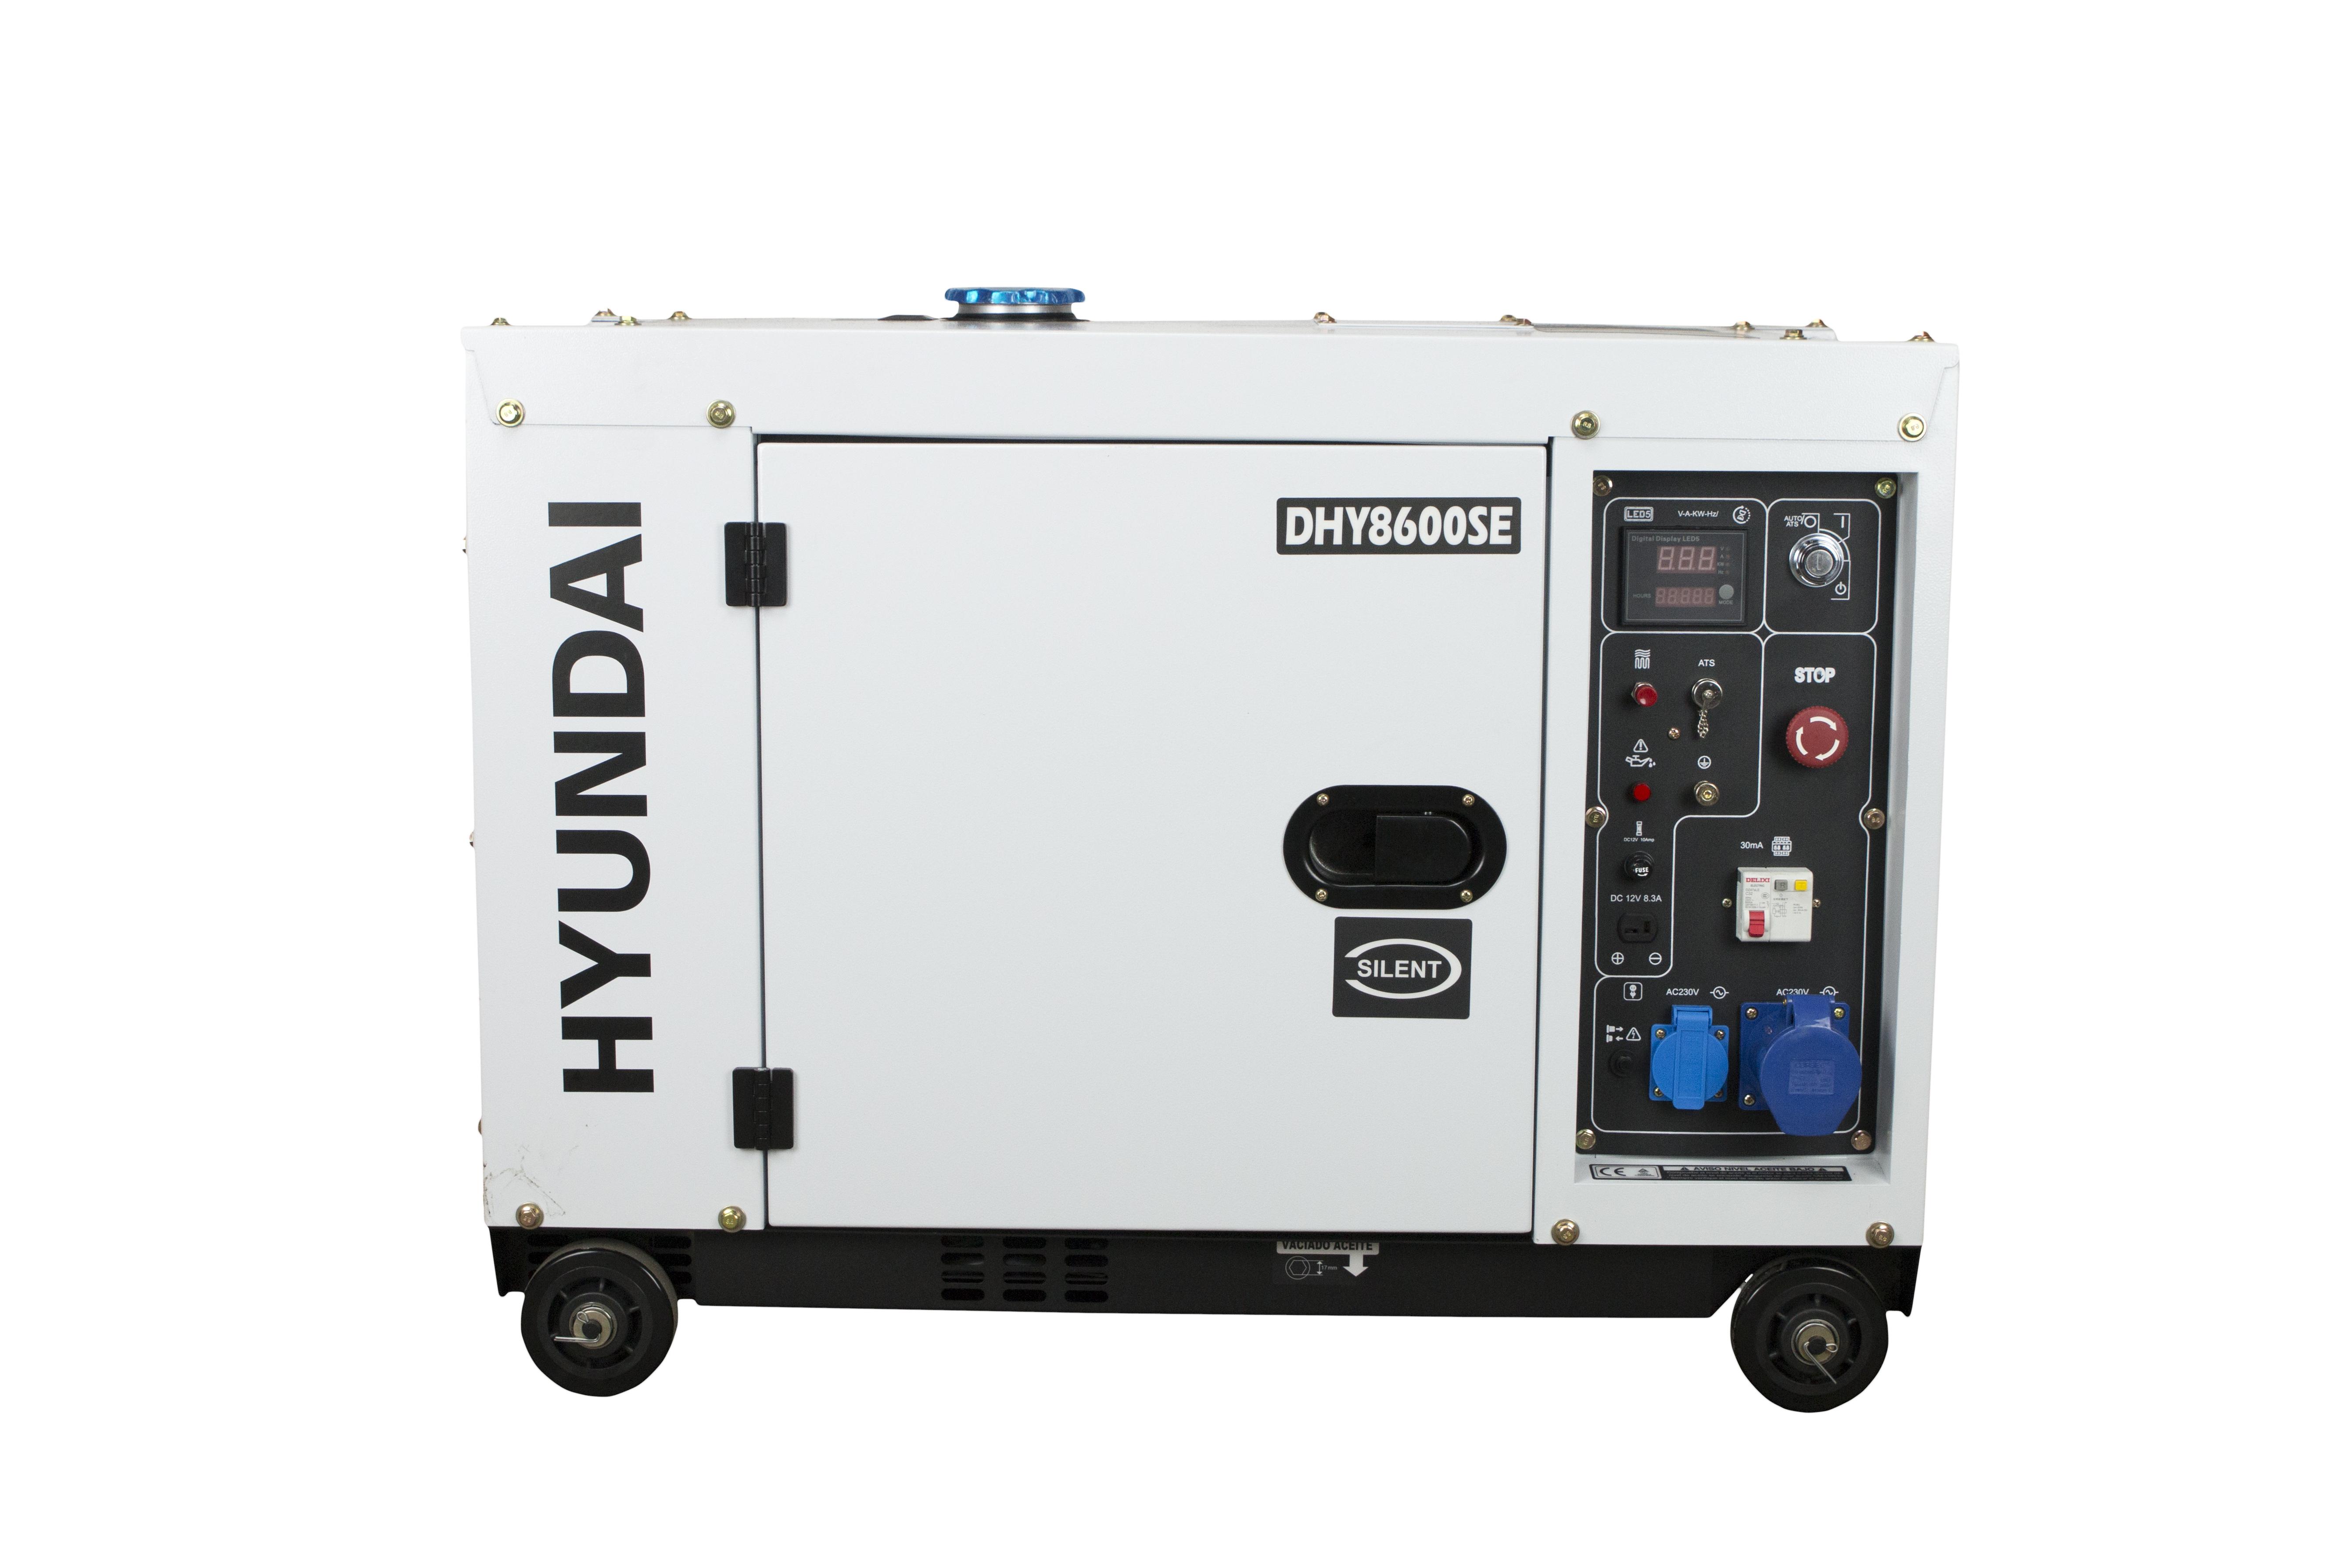 HYUNDAI 6500 Watt Diesel DHY8600SE Stromaggregat